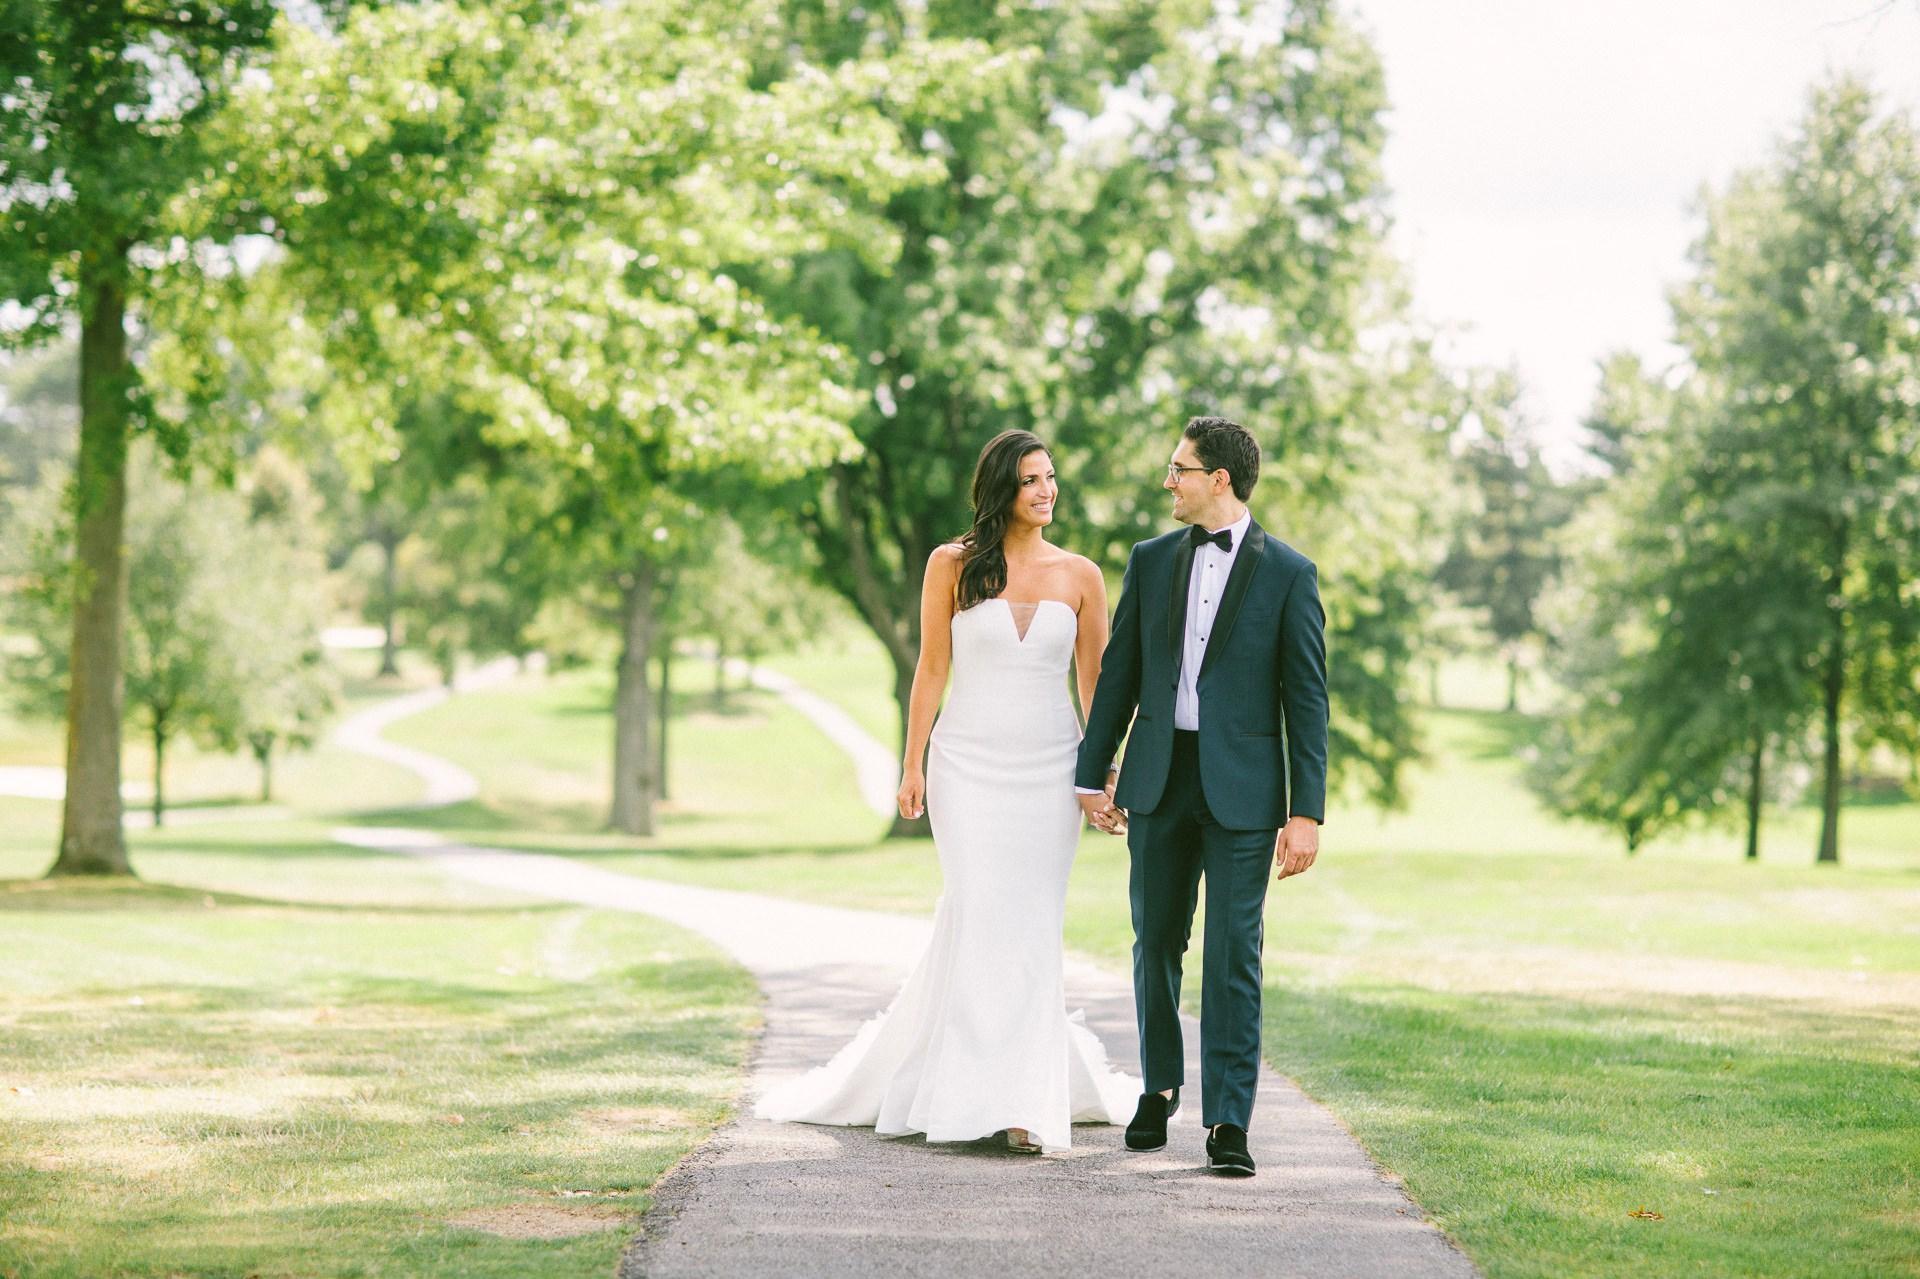 Beechmont Country Club Wedding Photographer in Beachwood 1 34.jpg